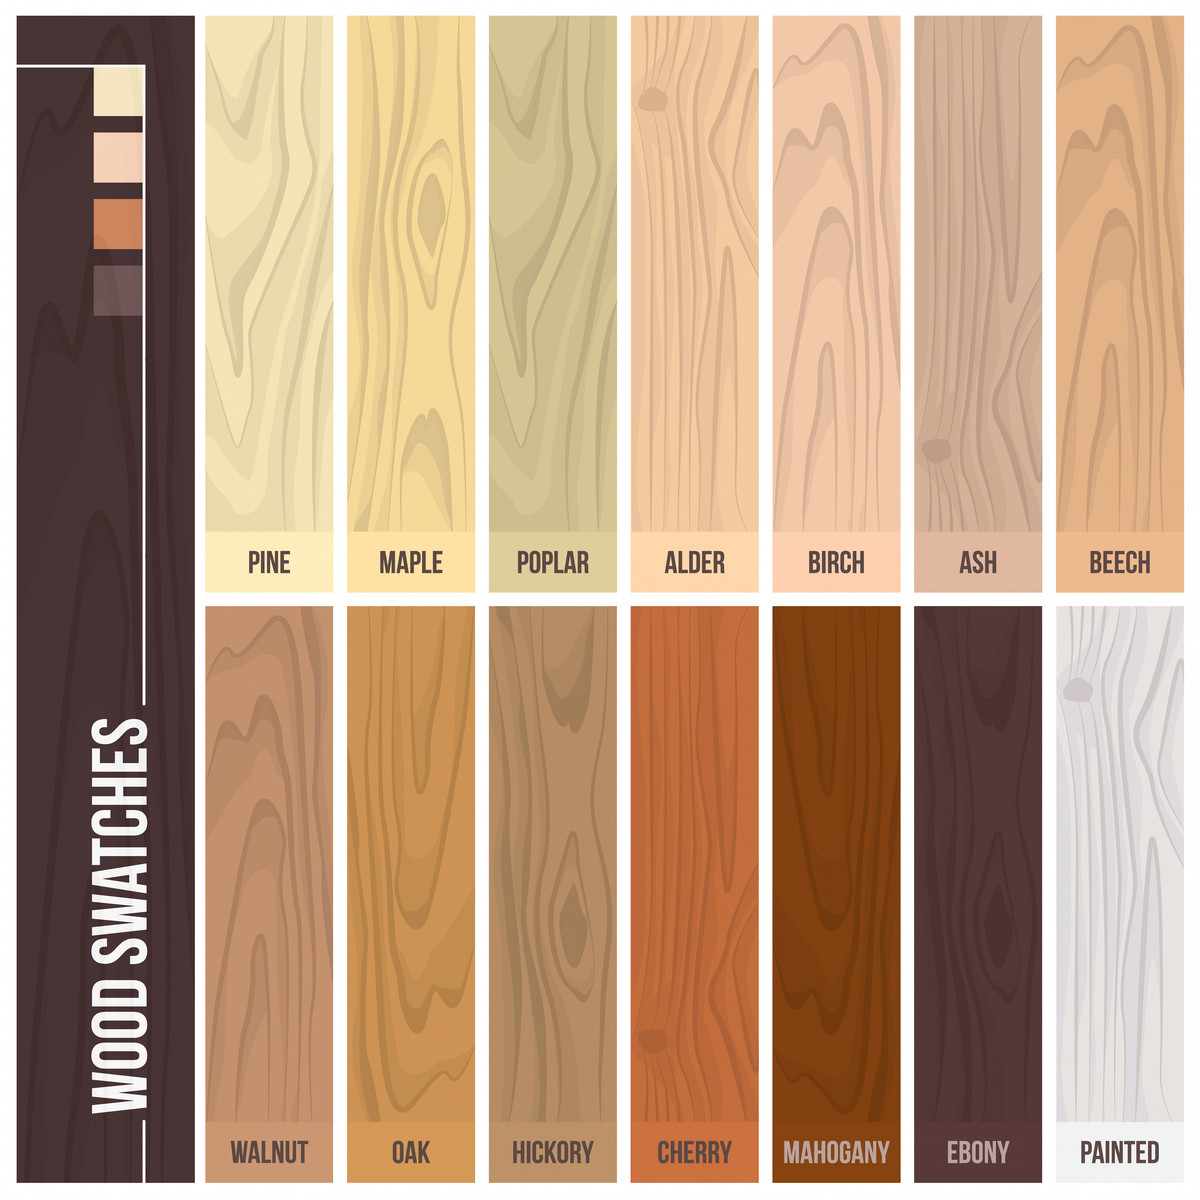 extra wide plank hardwood flooring of 12 types of hardwood flooring species styles edging dimensions throughout types of hardwood flooring illustrated guide